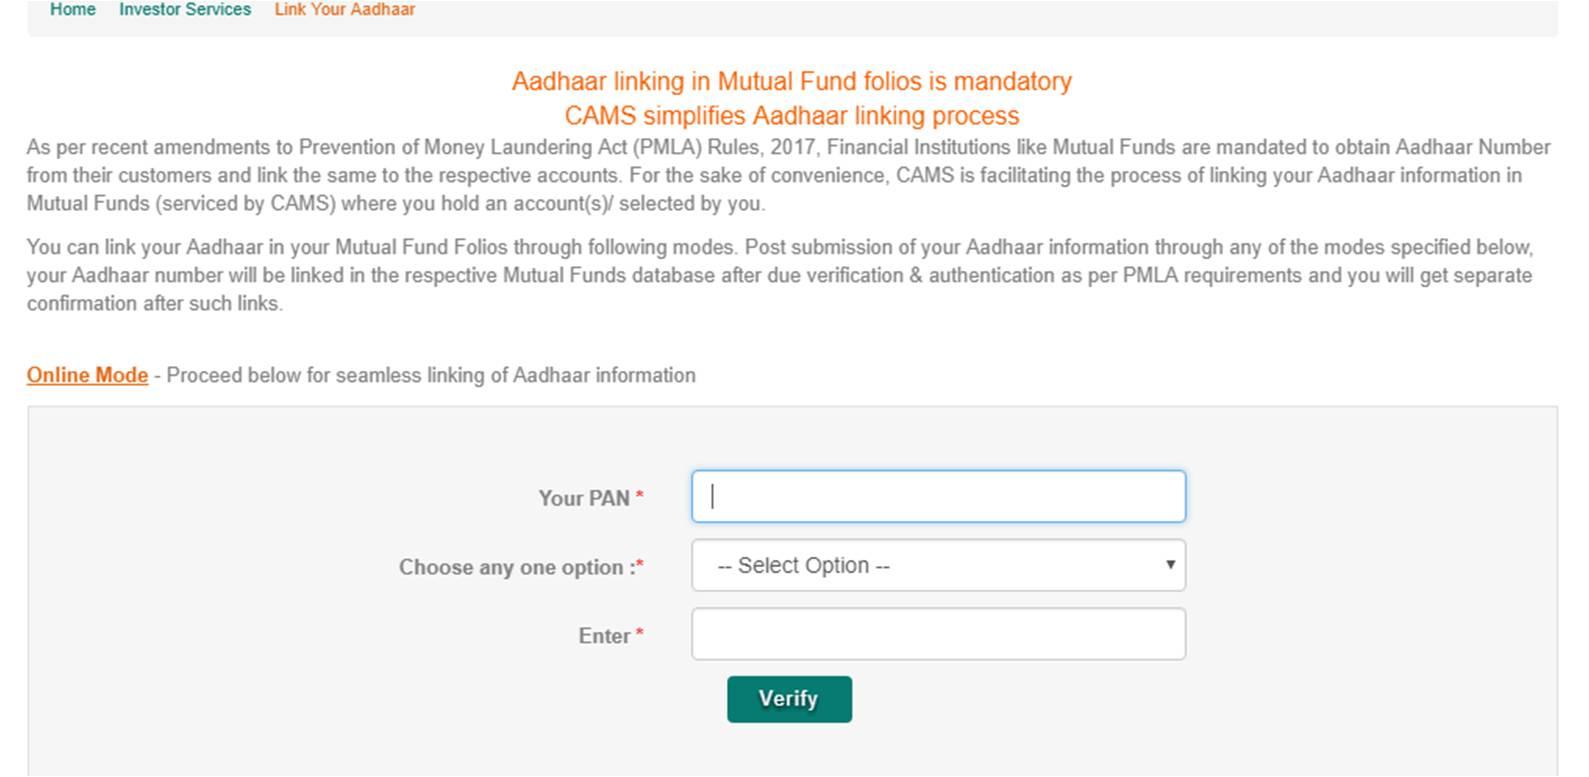 Aadhaar linking to Mutual funds CAMS